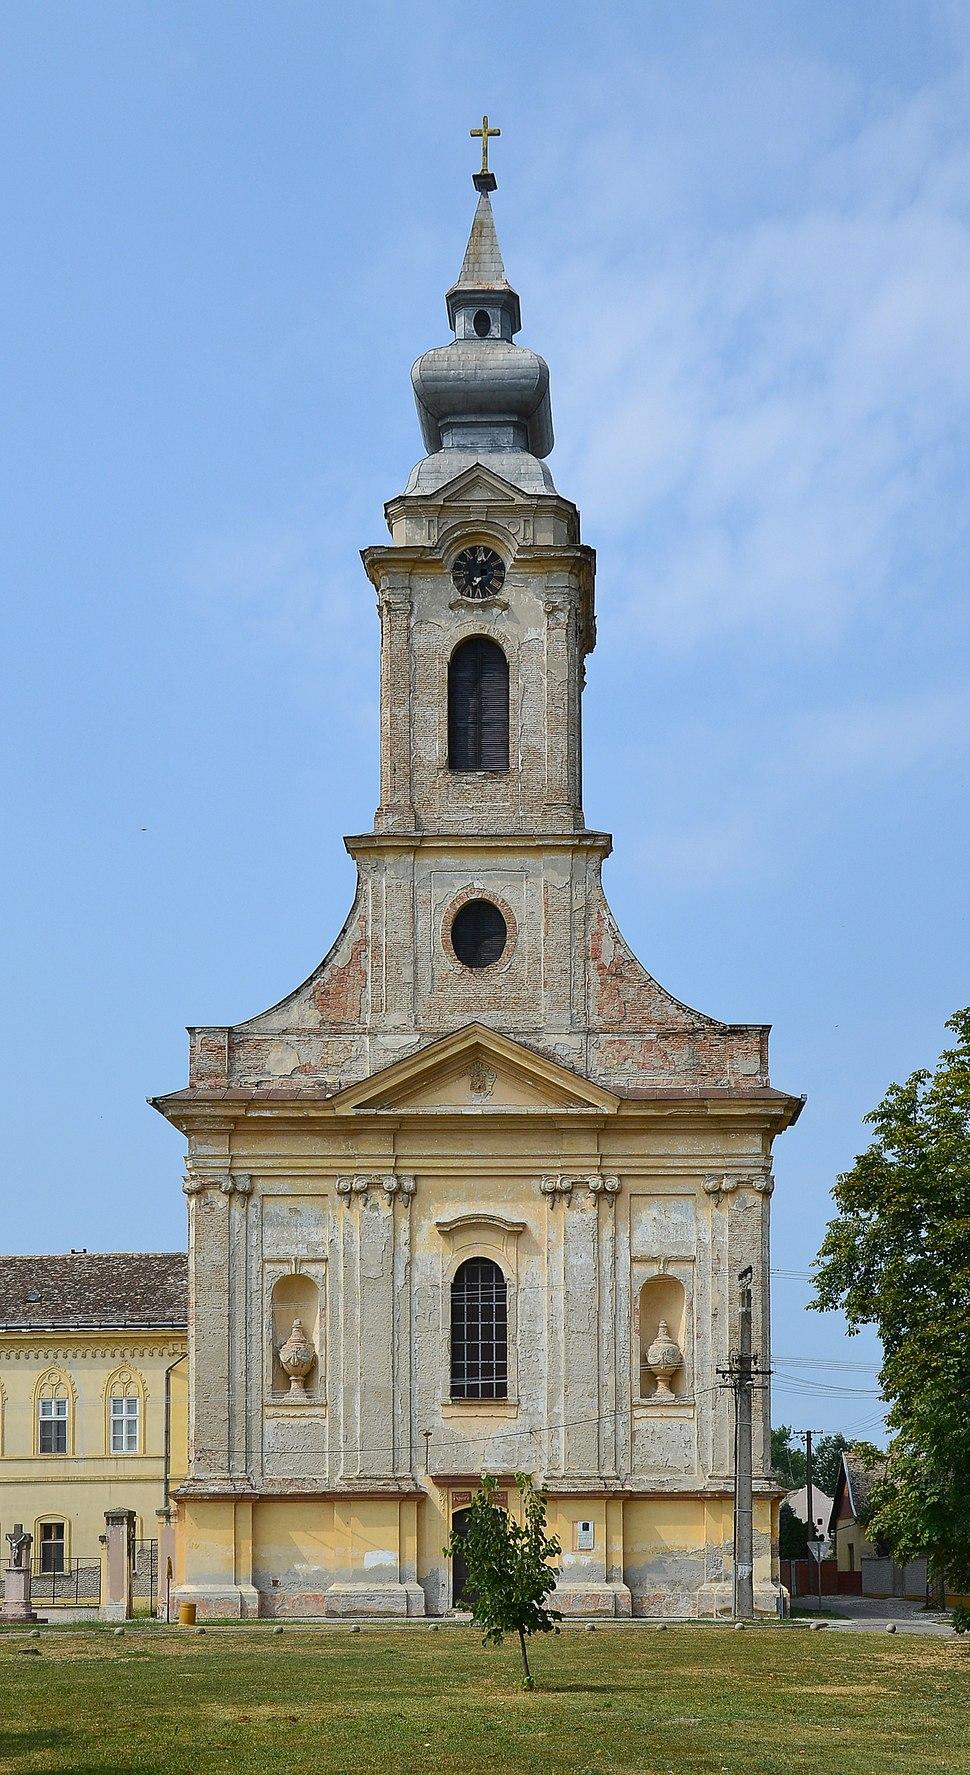 Saint Paul's Church in Bač (Bács)